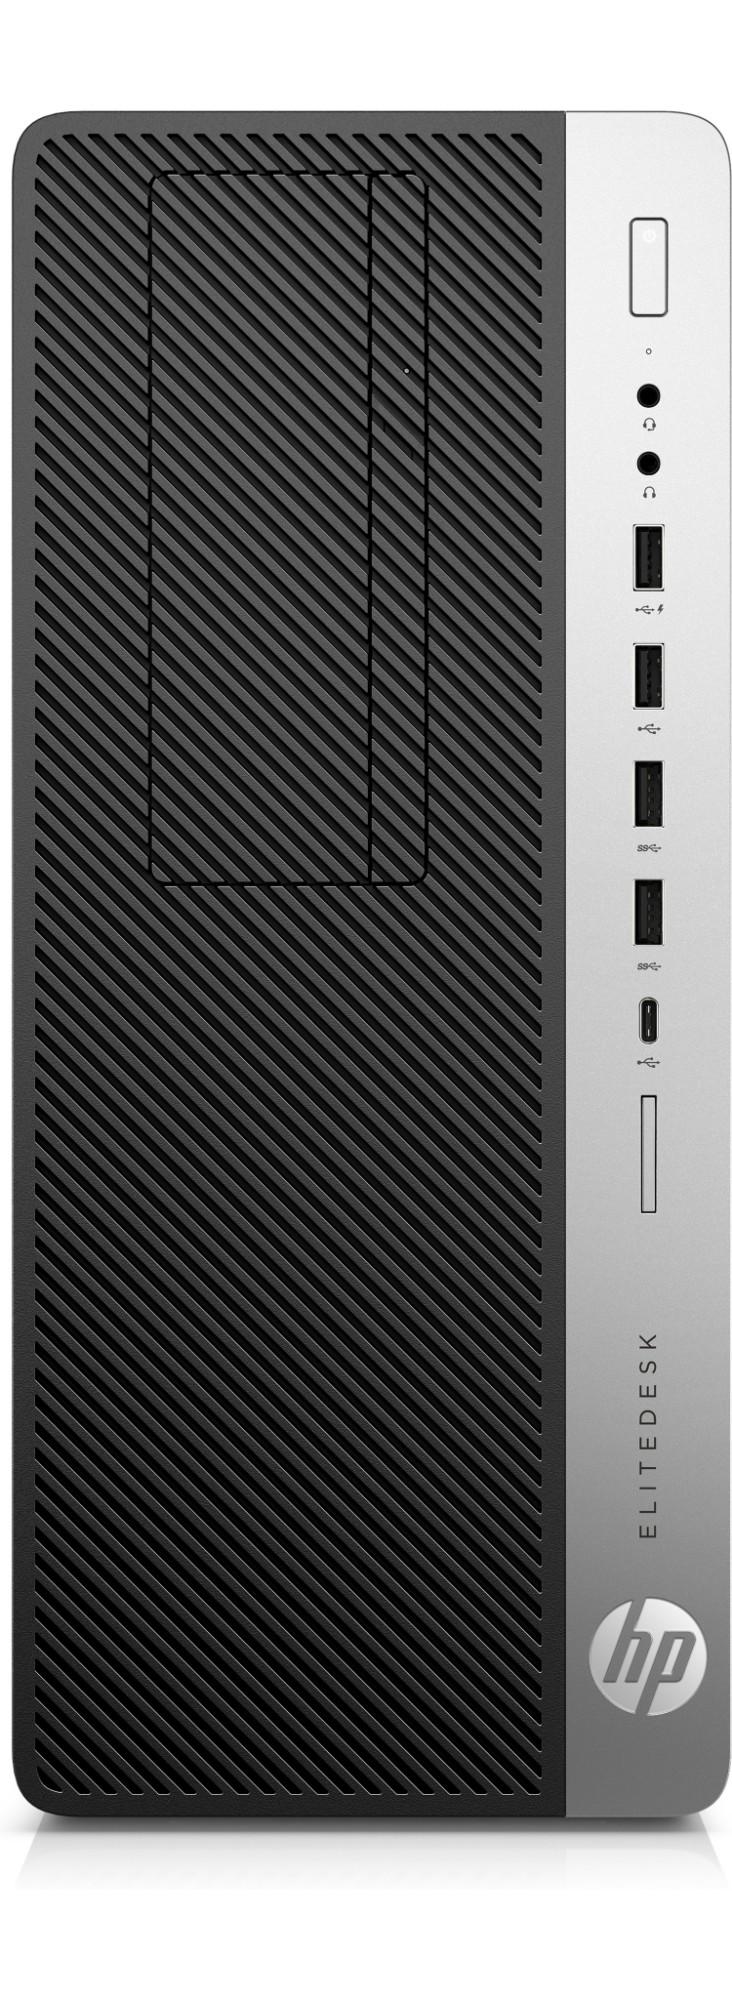 HP EliteDesk 800 G3 3.2GHz i5-6500 Tower Black, Silver PC